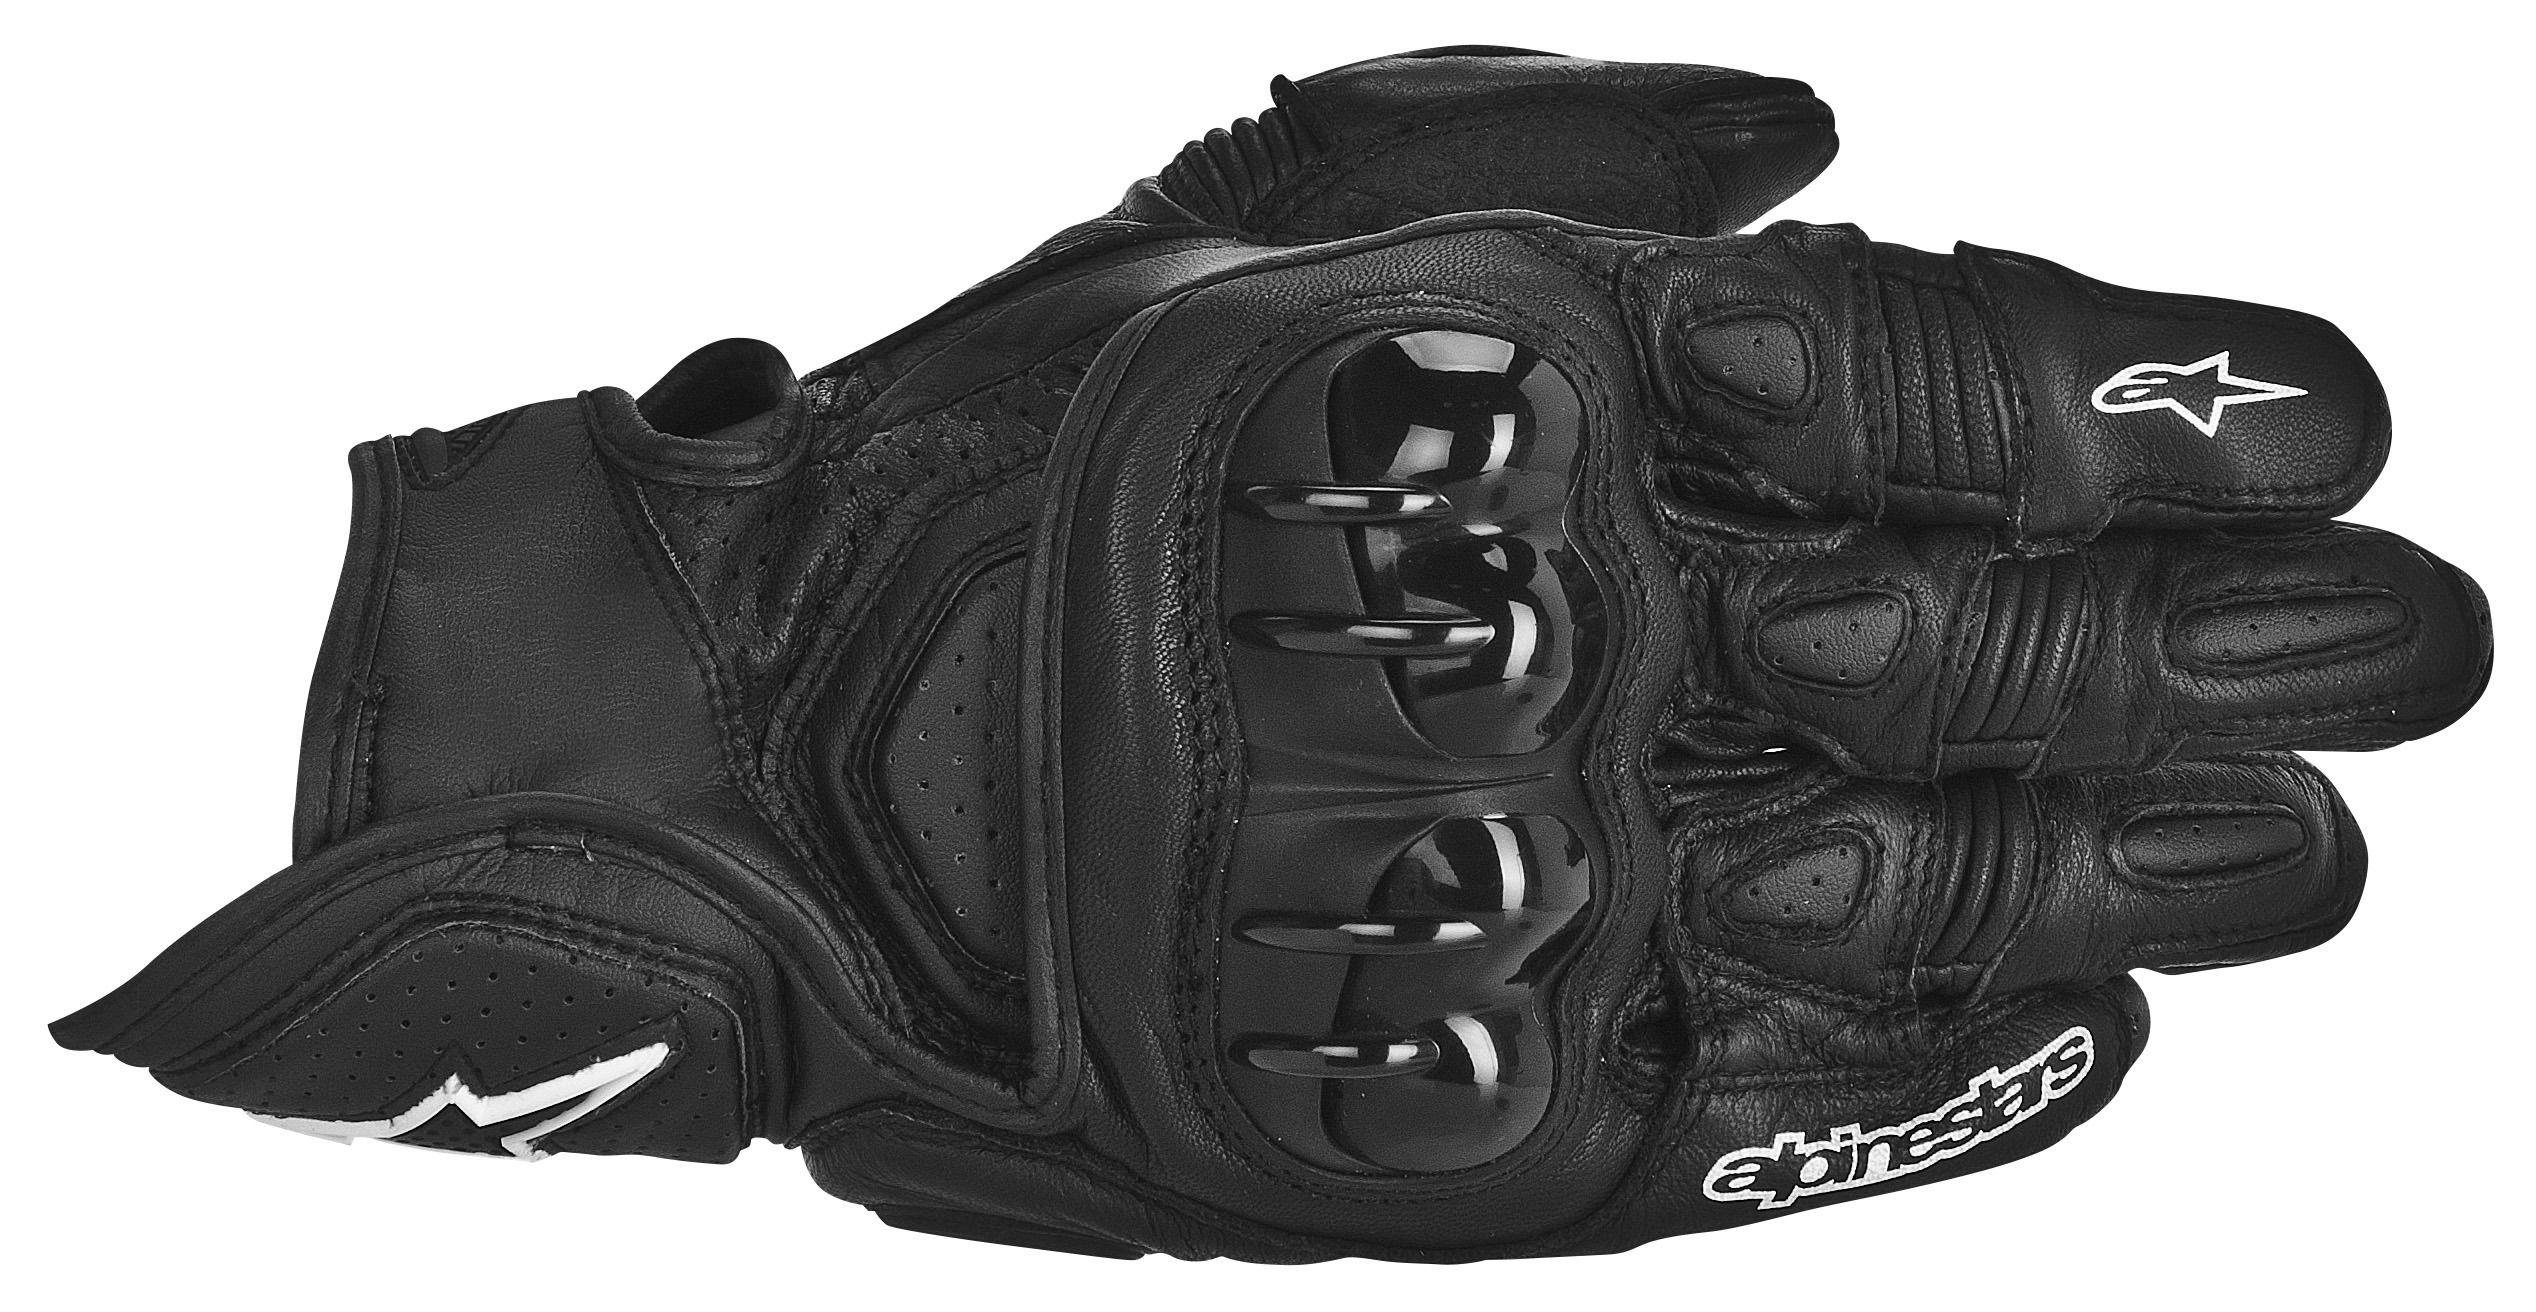 Motorcycle gloves review 2016 - Motorcycle Gloves Review 2016 26